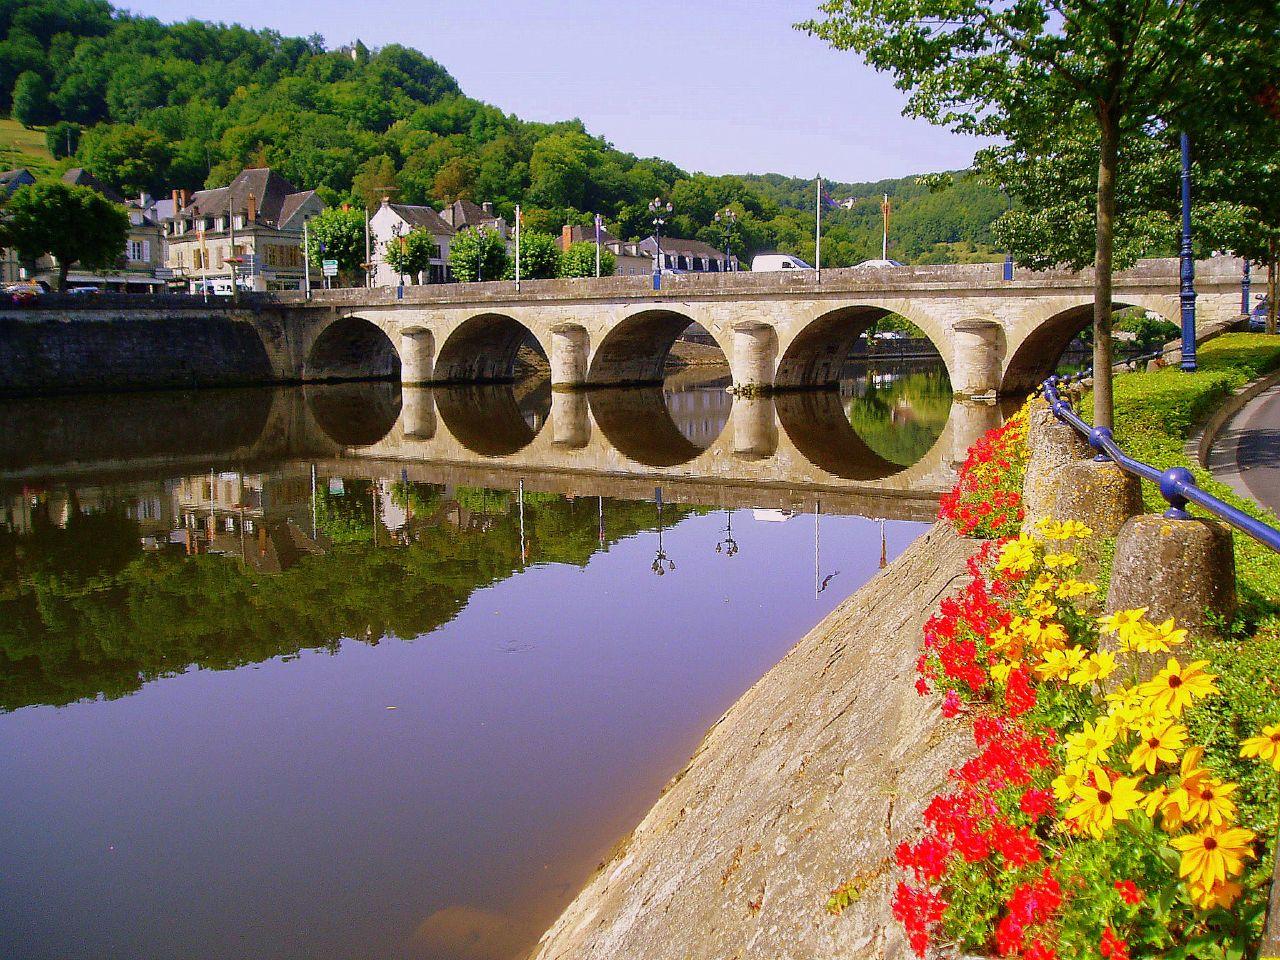 France - Image credit by Fr Antunes